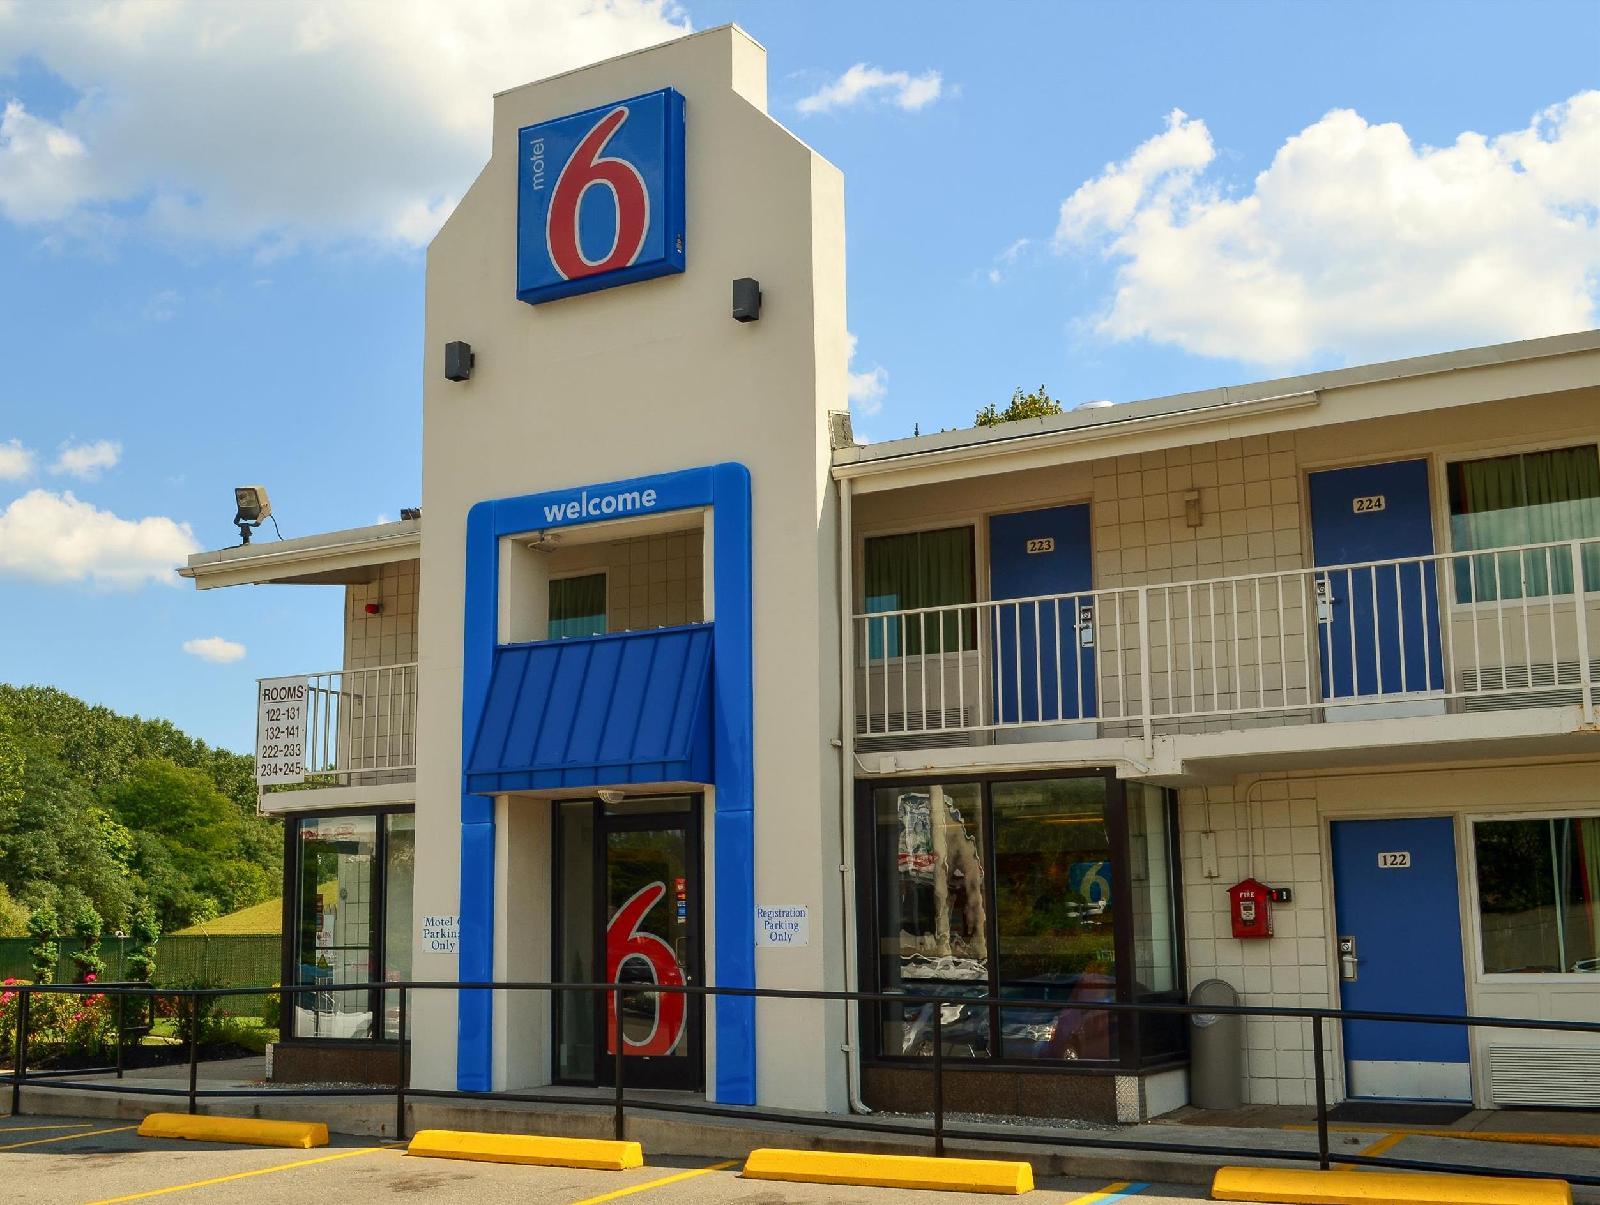 Gallery image of Motel 6 Boston Braintree